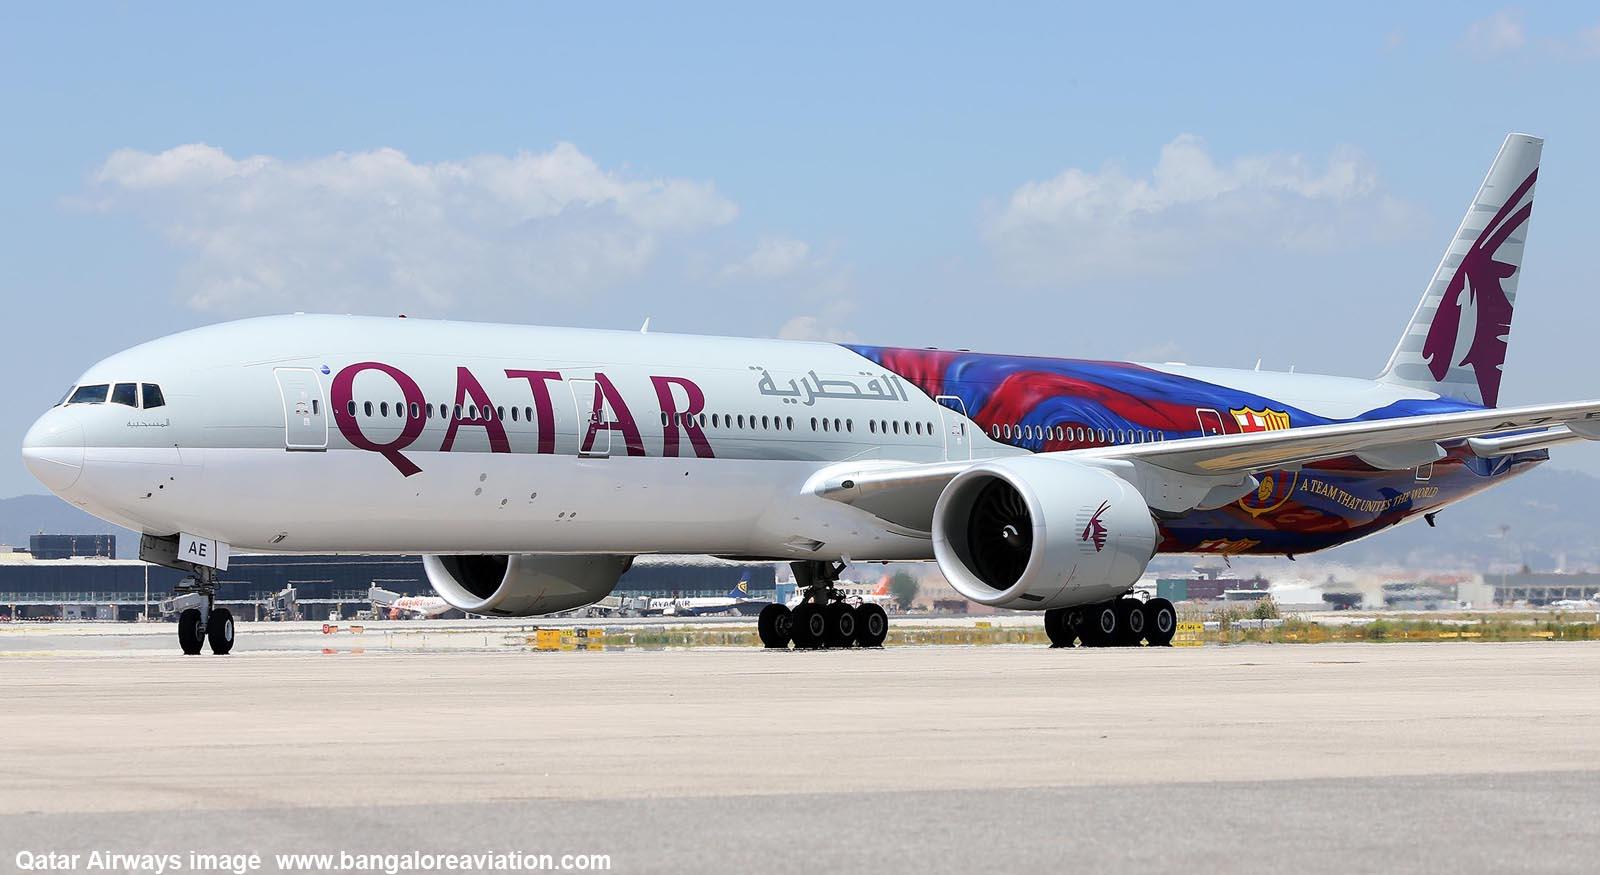 Qatar Airways CEO says laptop ban will send militants elsewhere: Irish Times